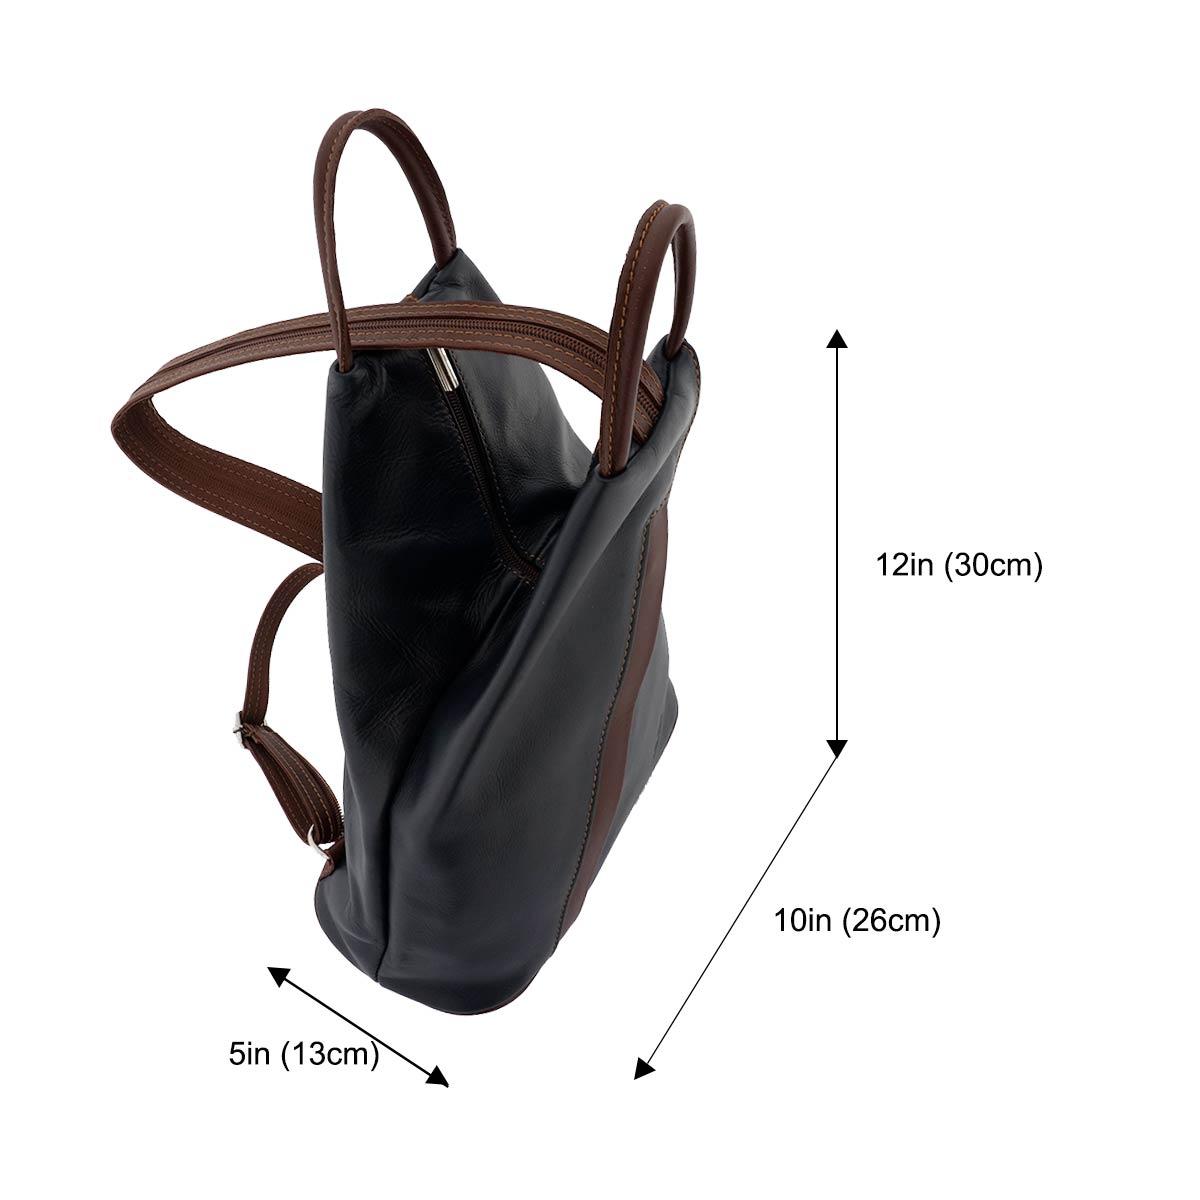 Fioretta Italian Genuine Leather Top Handle Backpack Purse Shoulder Bag Handbag Rucksack For Women - Dark Blue Brown